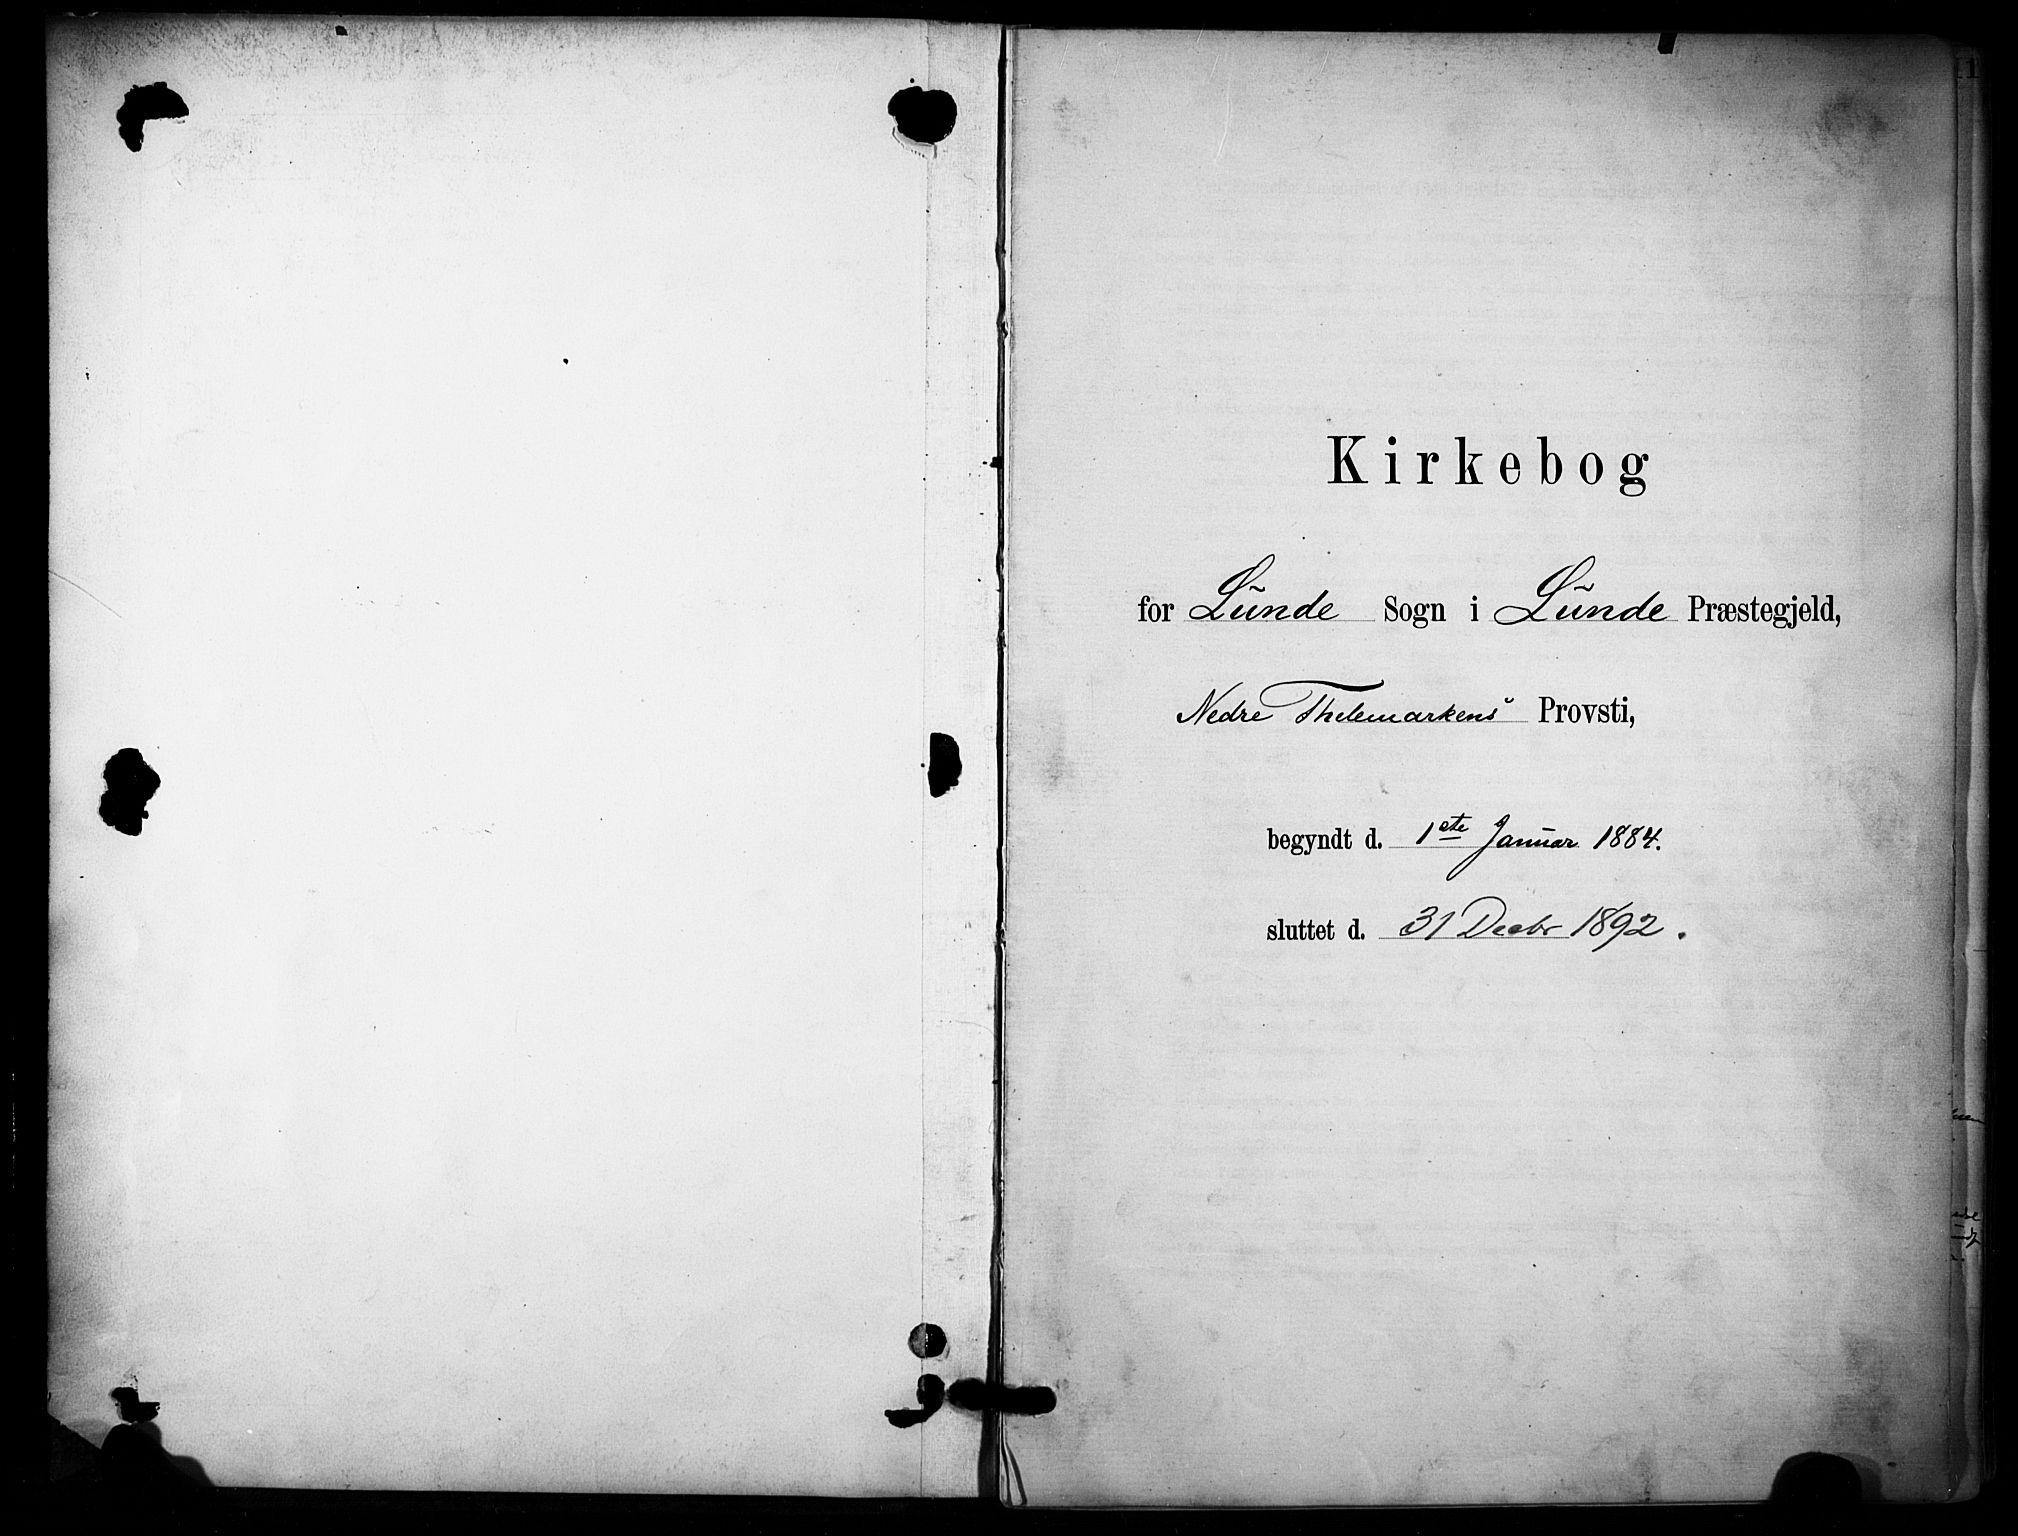 SAKO, Lunde kirkebøker, F/Fa/L0002: Ministerialbok nr. I 2, 1884-1892